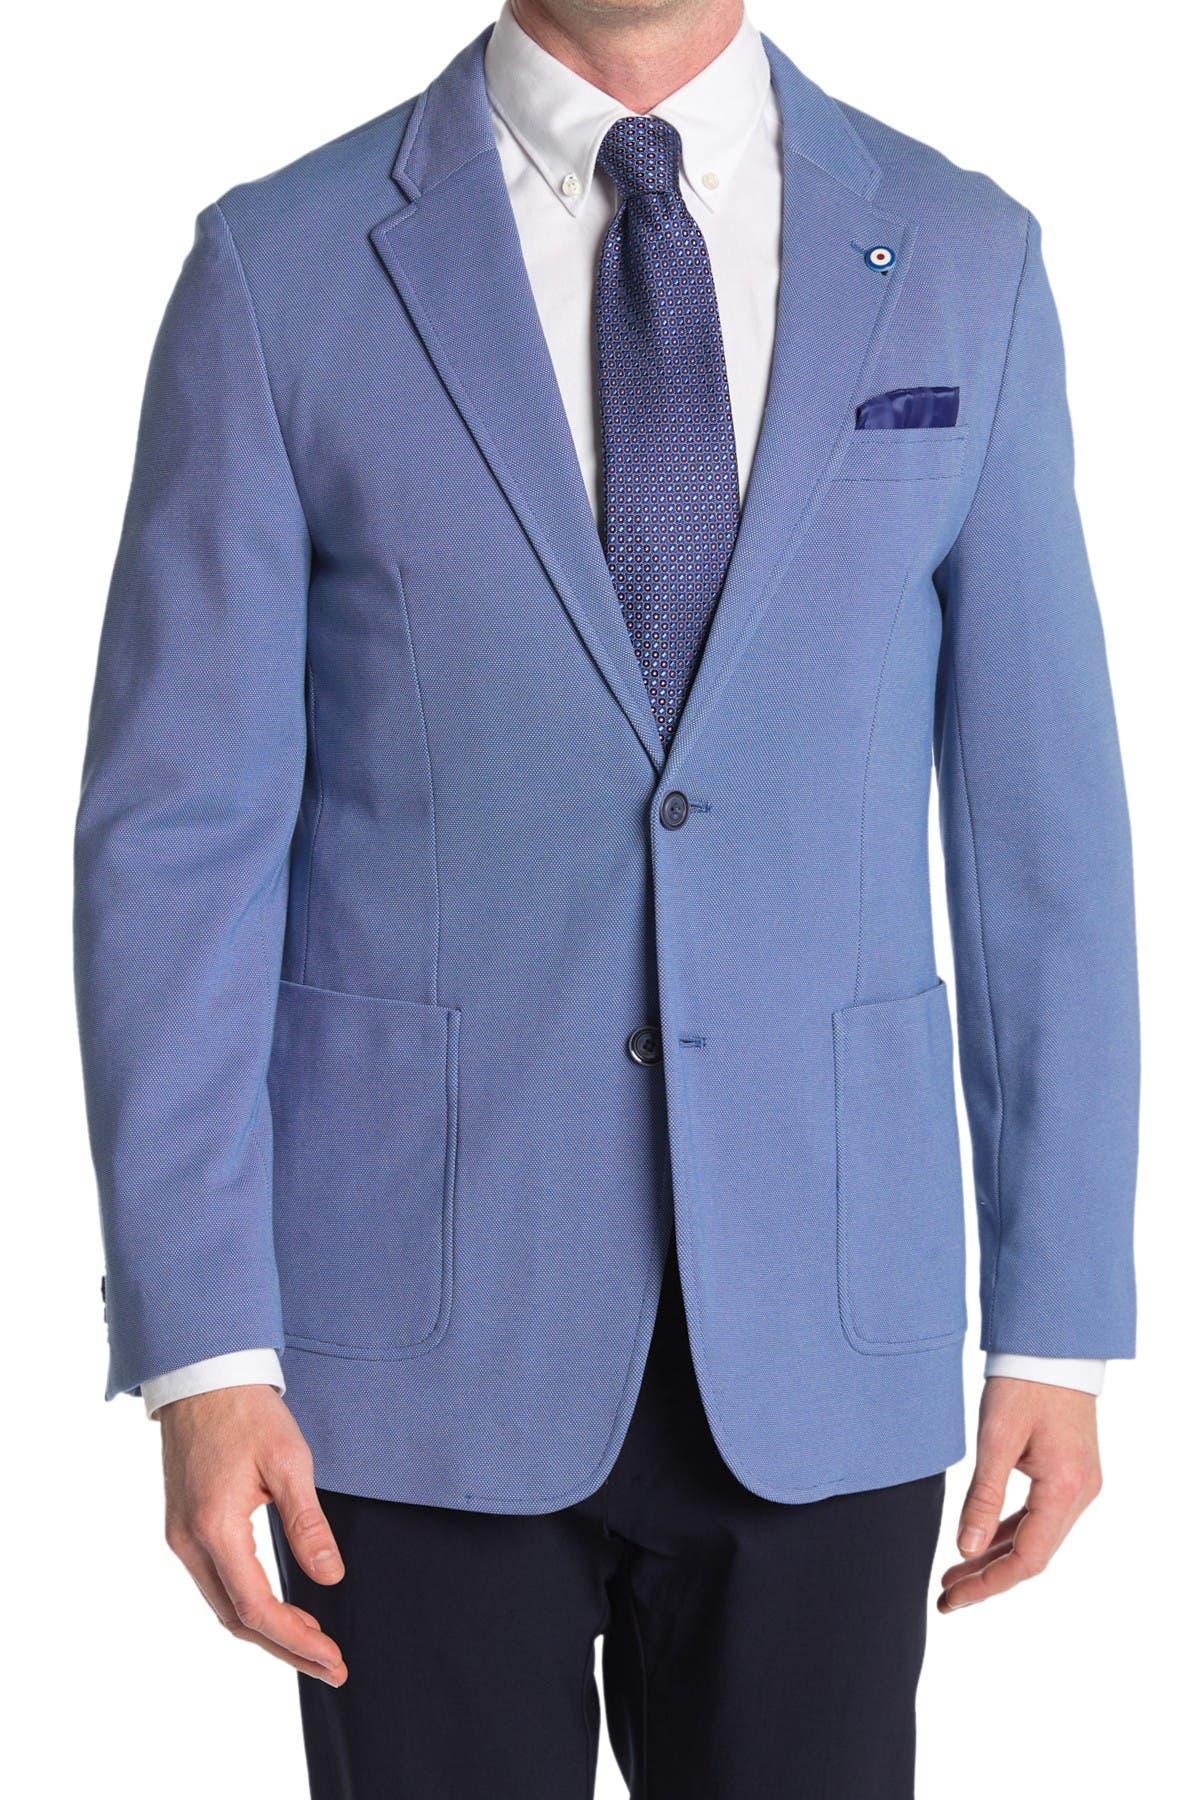 Image of Ben Sherman Blue Birdseye Two Button Notch Lapel Union Fit Sport Coat